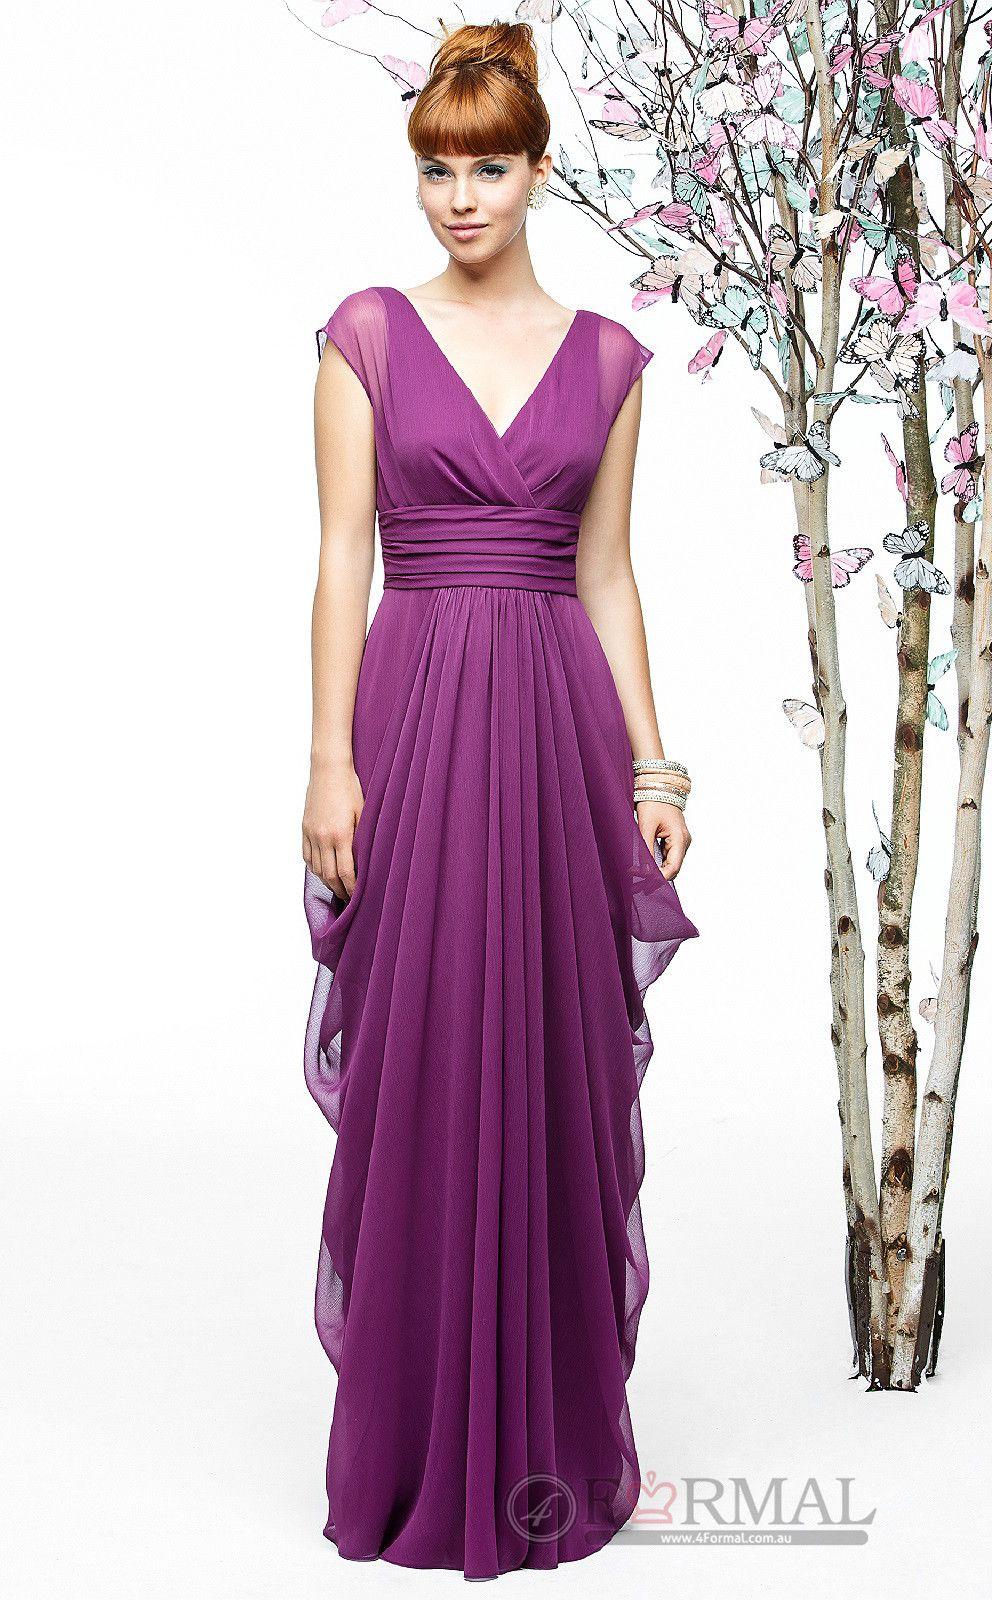 Elegant With Sleeves V-Neck Chiffon Long Bridesmaid Formal Dress ...